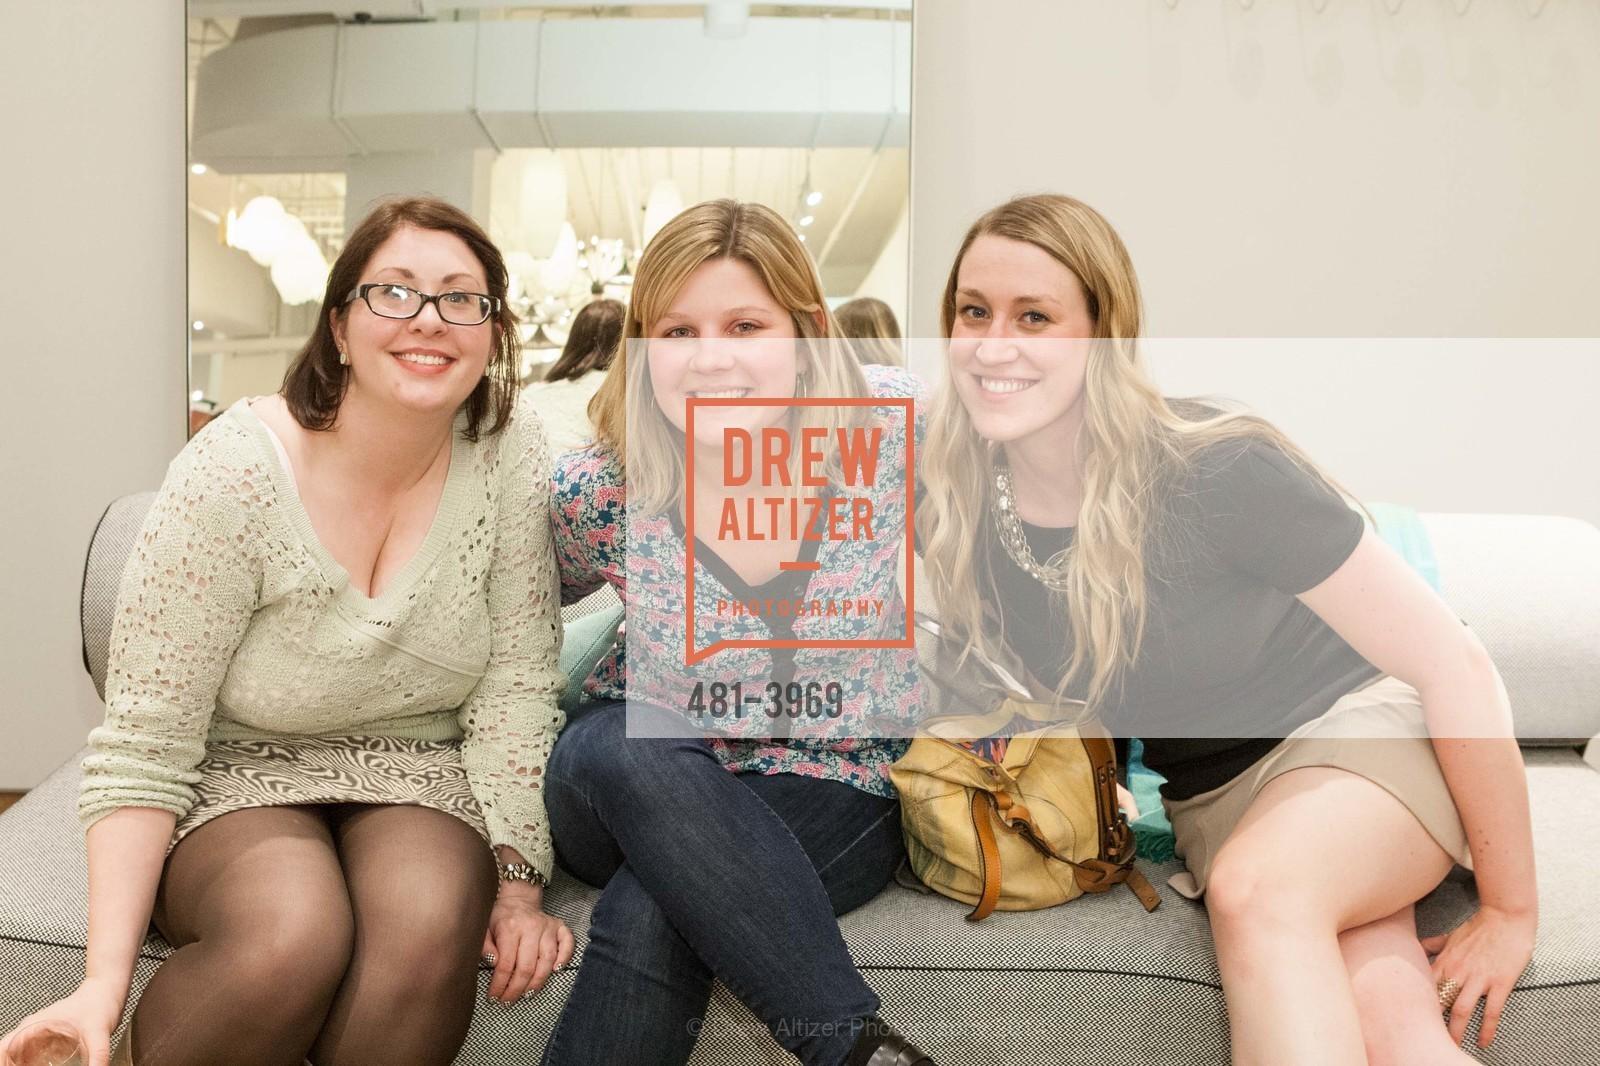 Rebekah Jatovi, Blaire Kruger, Kristin Look, Photo #481-3969